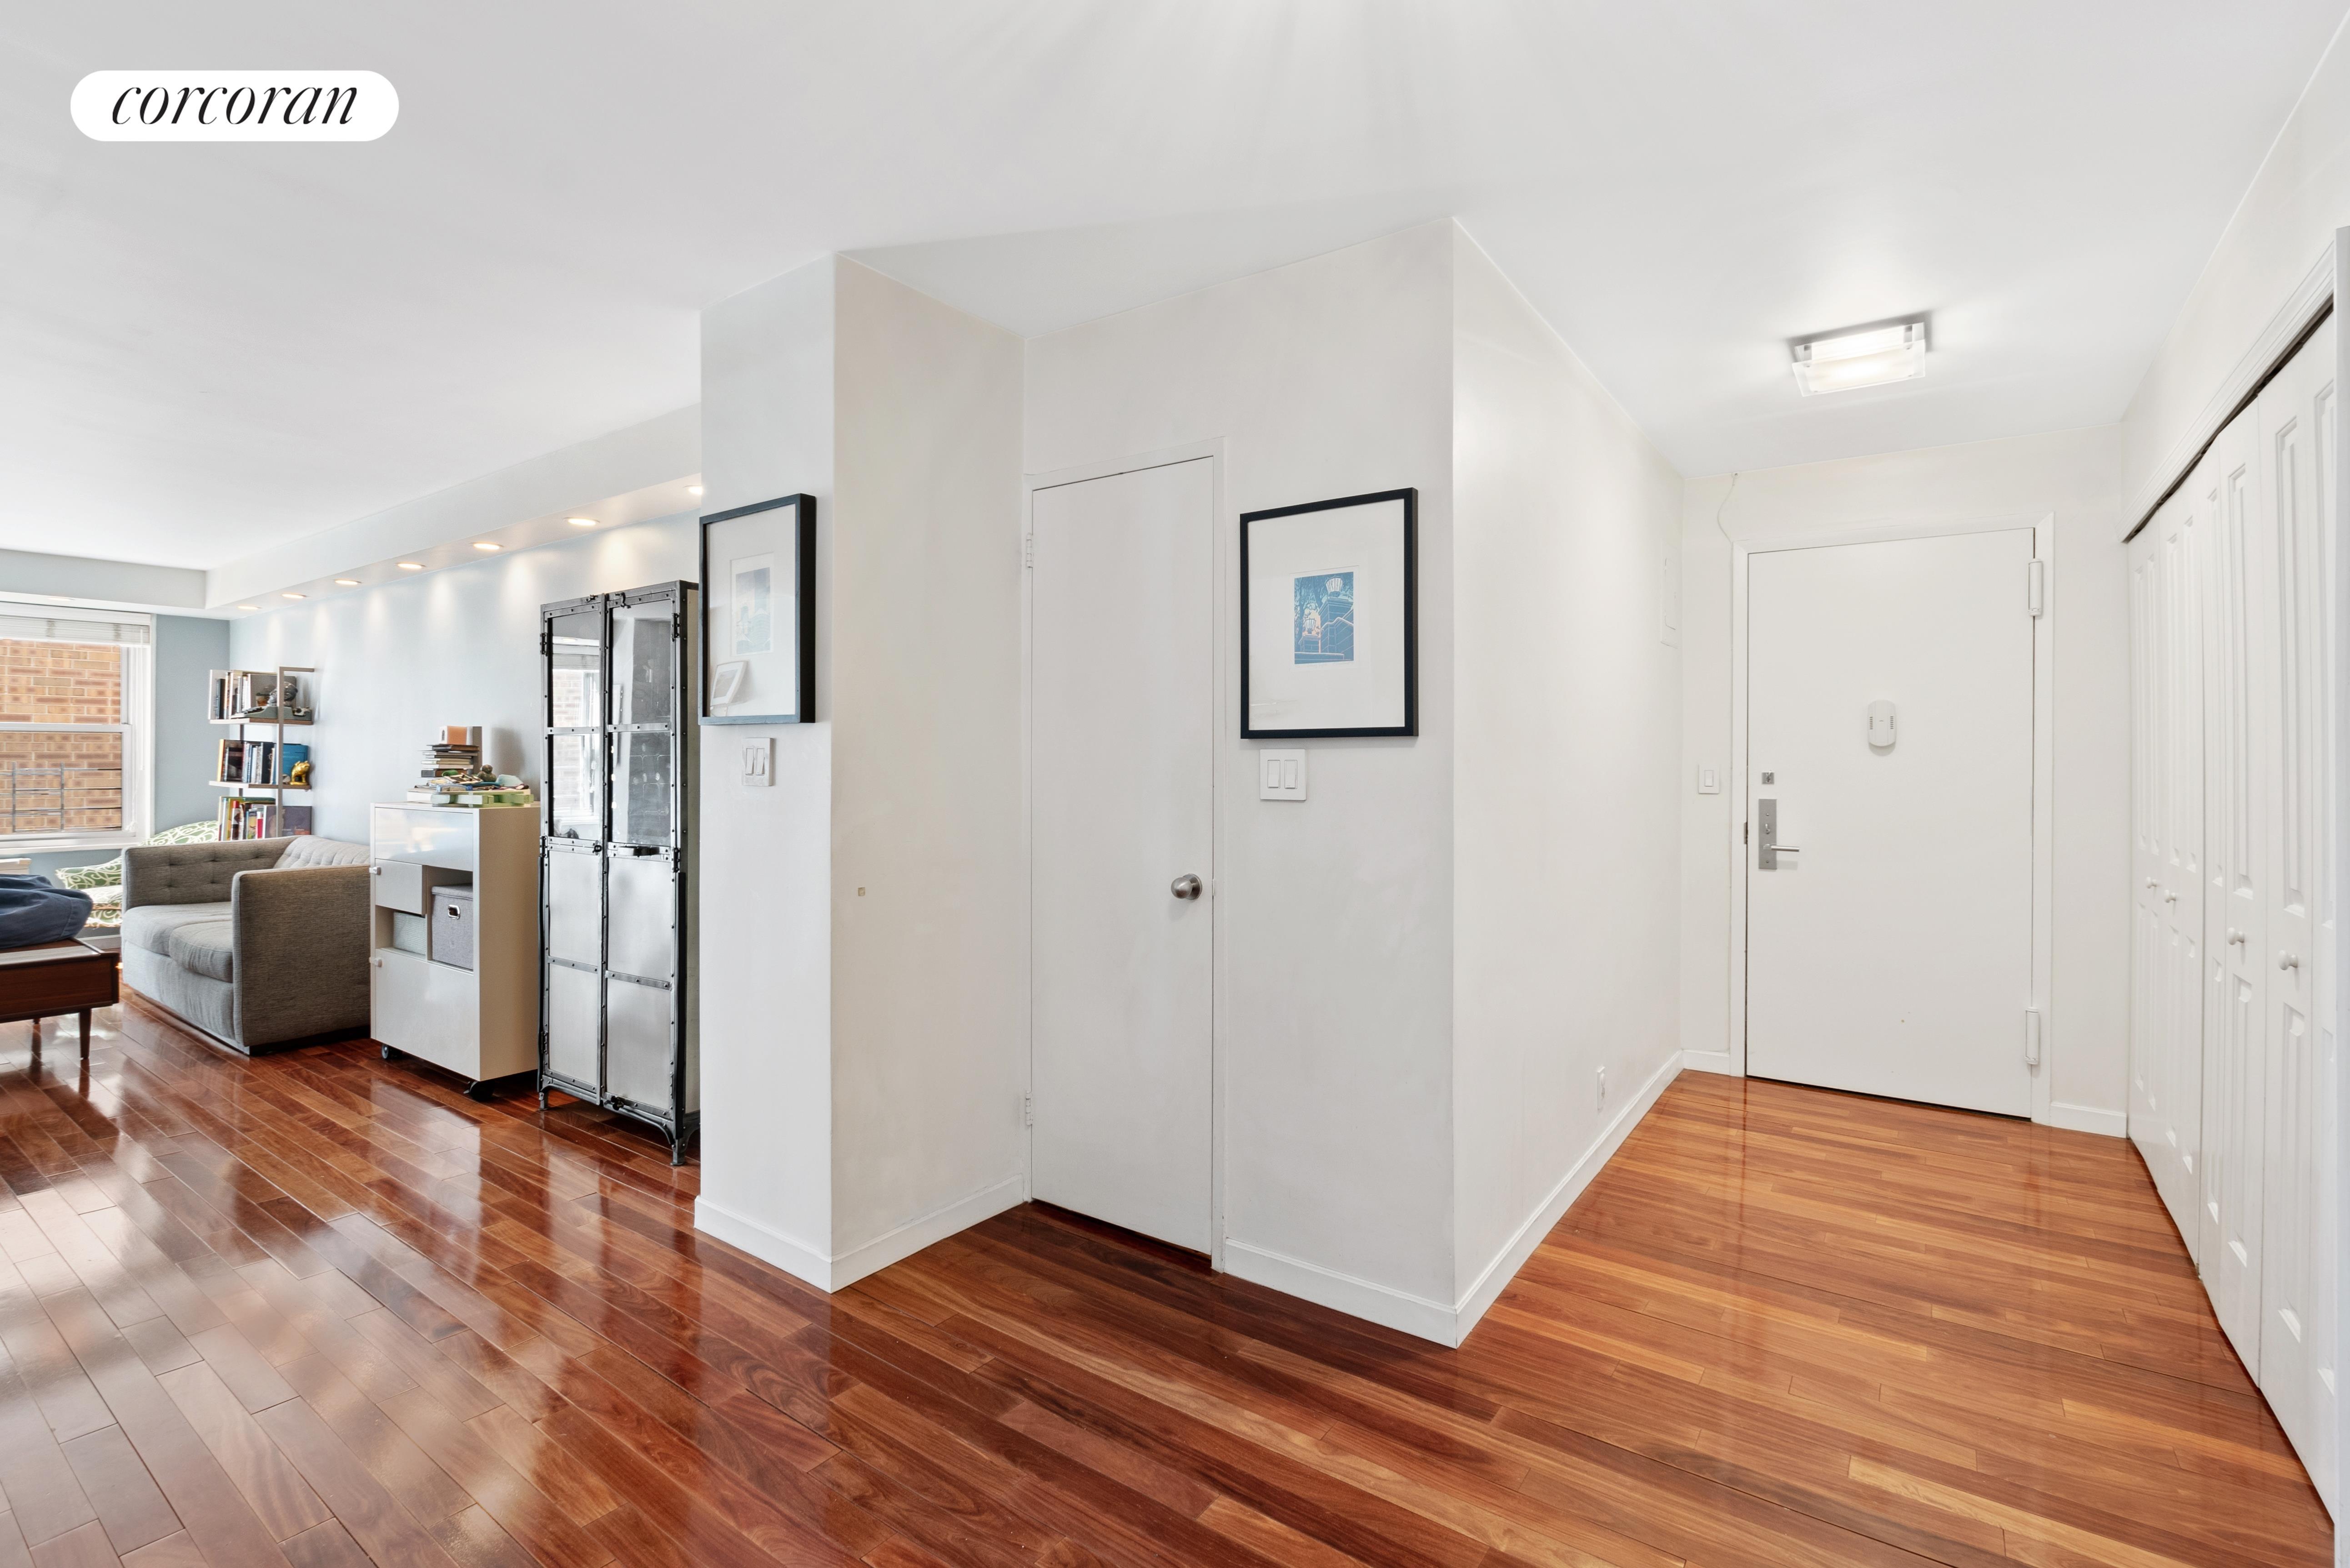 Apartment for sale at 205 Third Avenue, Apt 7S